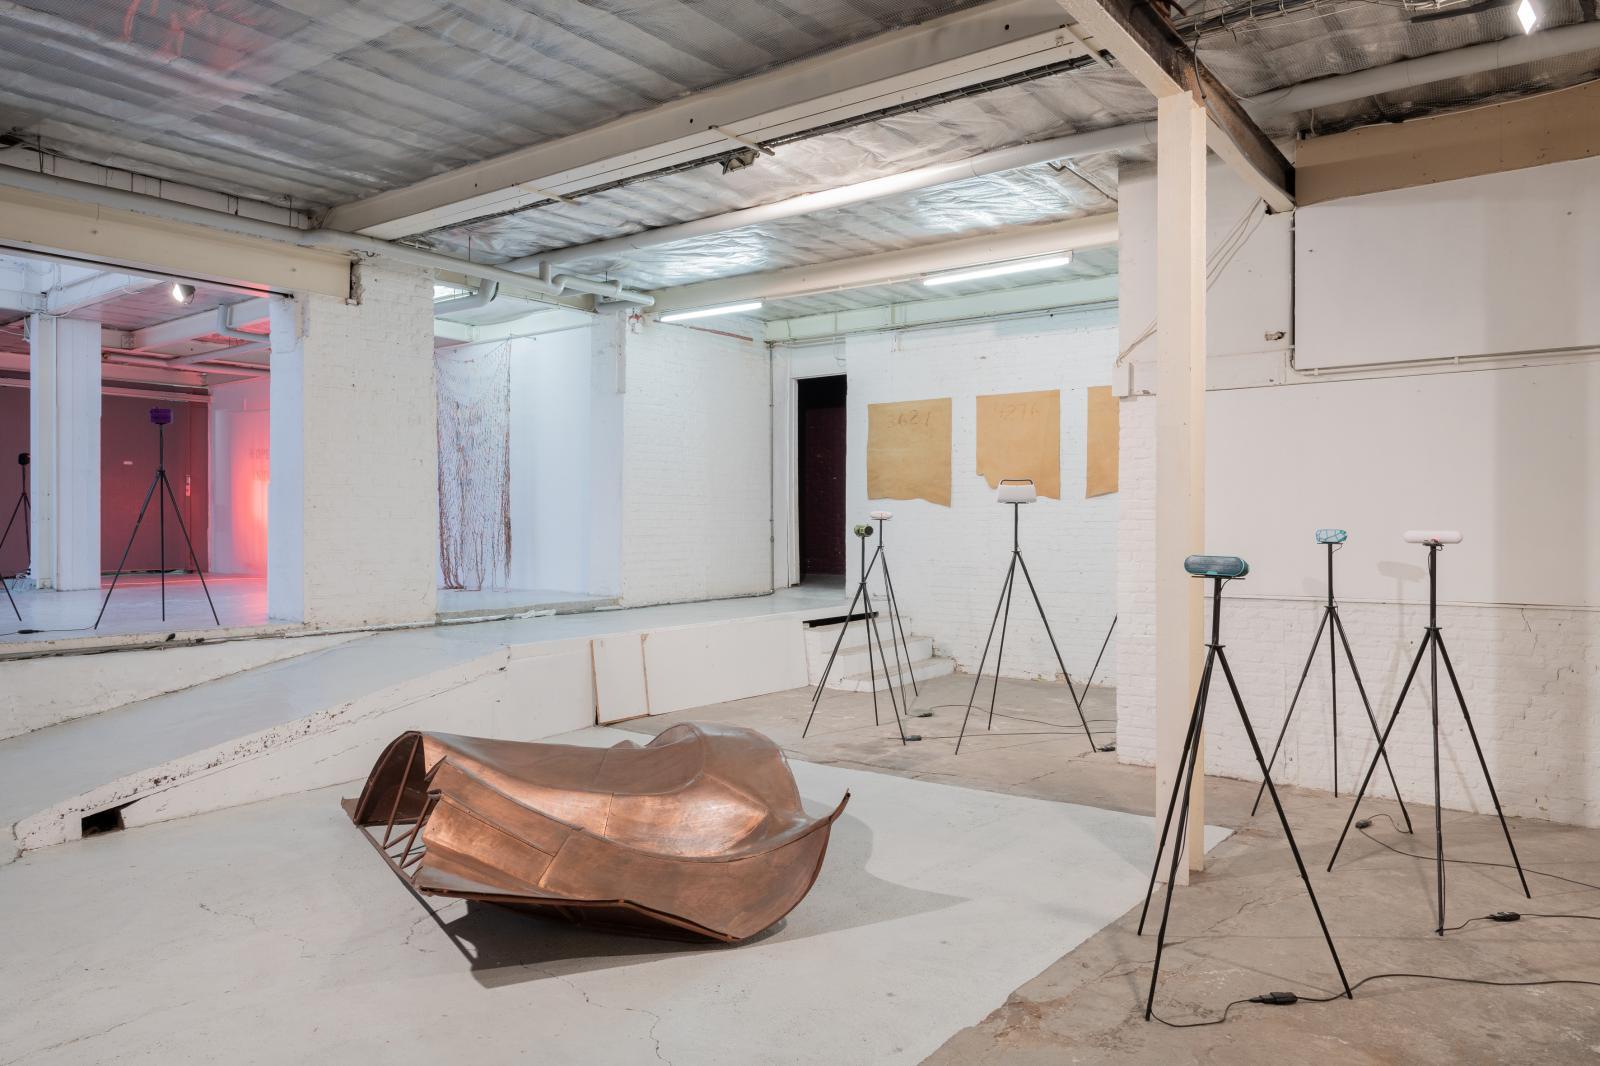 Vue de l'exposition «A from Animism, Atlas, Adrift…», The Loft , 2019, œuvres d'Oscar Santillan, Yerbossyn Meldibekov, Danh Vo et Taus Mak